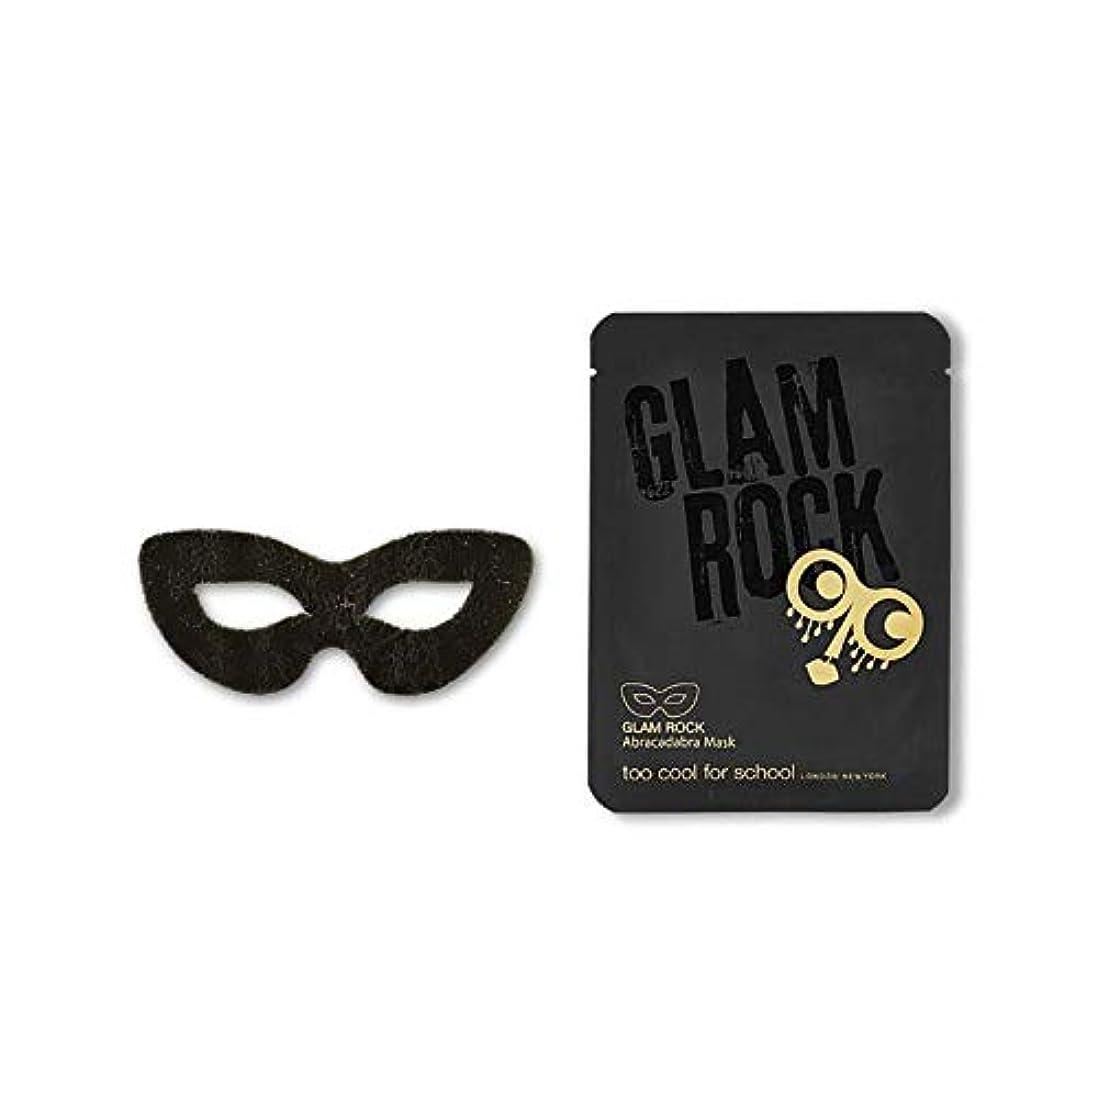 太鼓腹自我試用TOO COOL FOR SCHOOL Glam Rock Abracadabra Mask (並行輸入品)